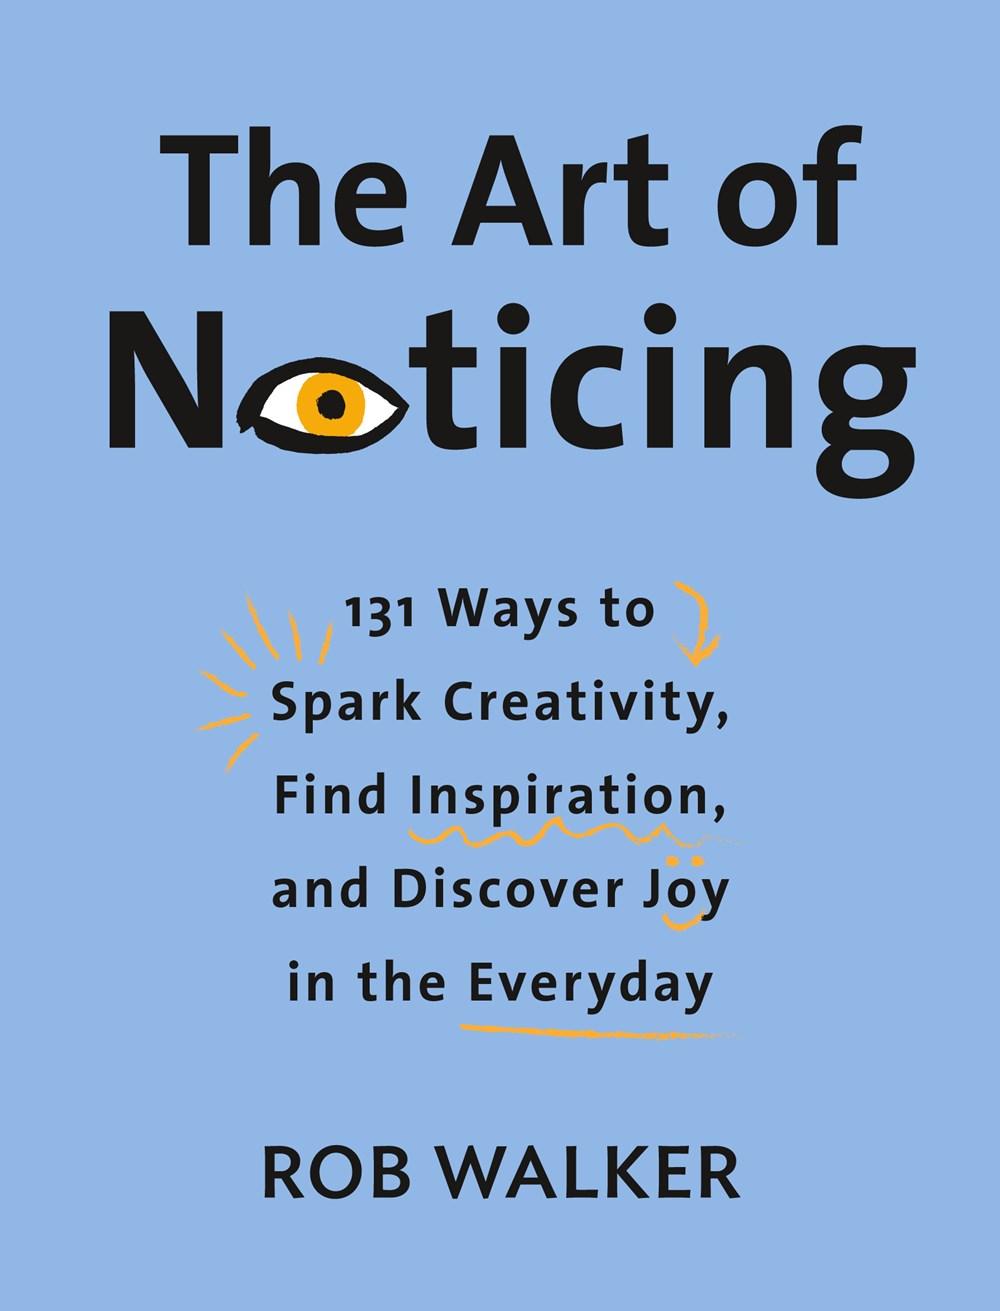 Art of Noticing